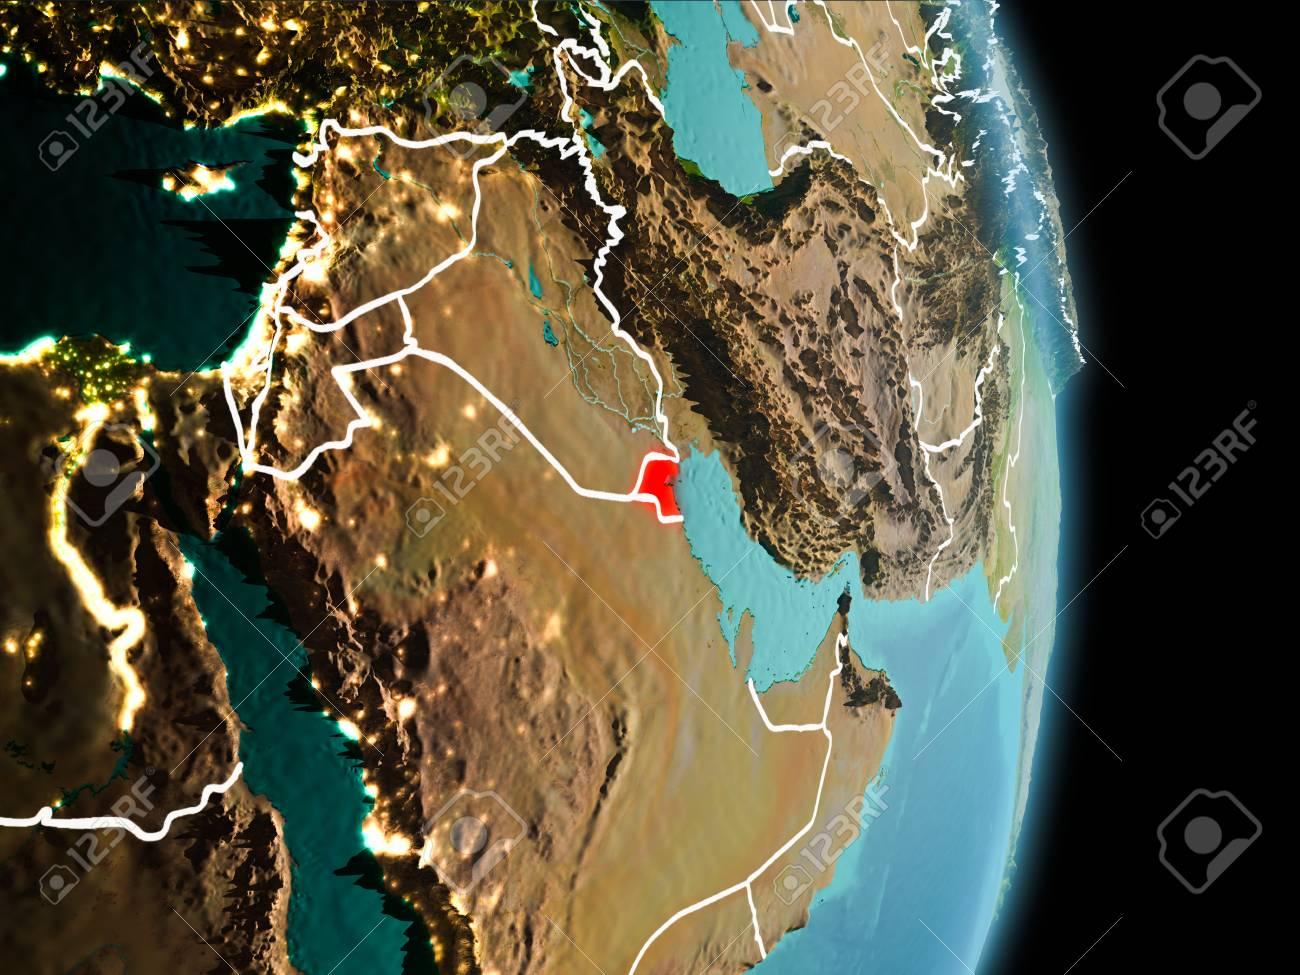 Stock Illustration on cairo map google earth, qatar map google earth, phnom penh map google earth, khartoum map google earth, maldives map google earth, manila map google earth, abu dhabi map google earth, mauritius map google earth, jeddah map google earth, dubai map google earth, juba map google earth,